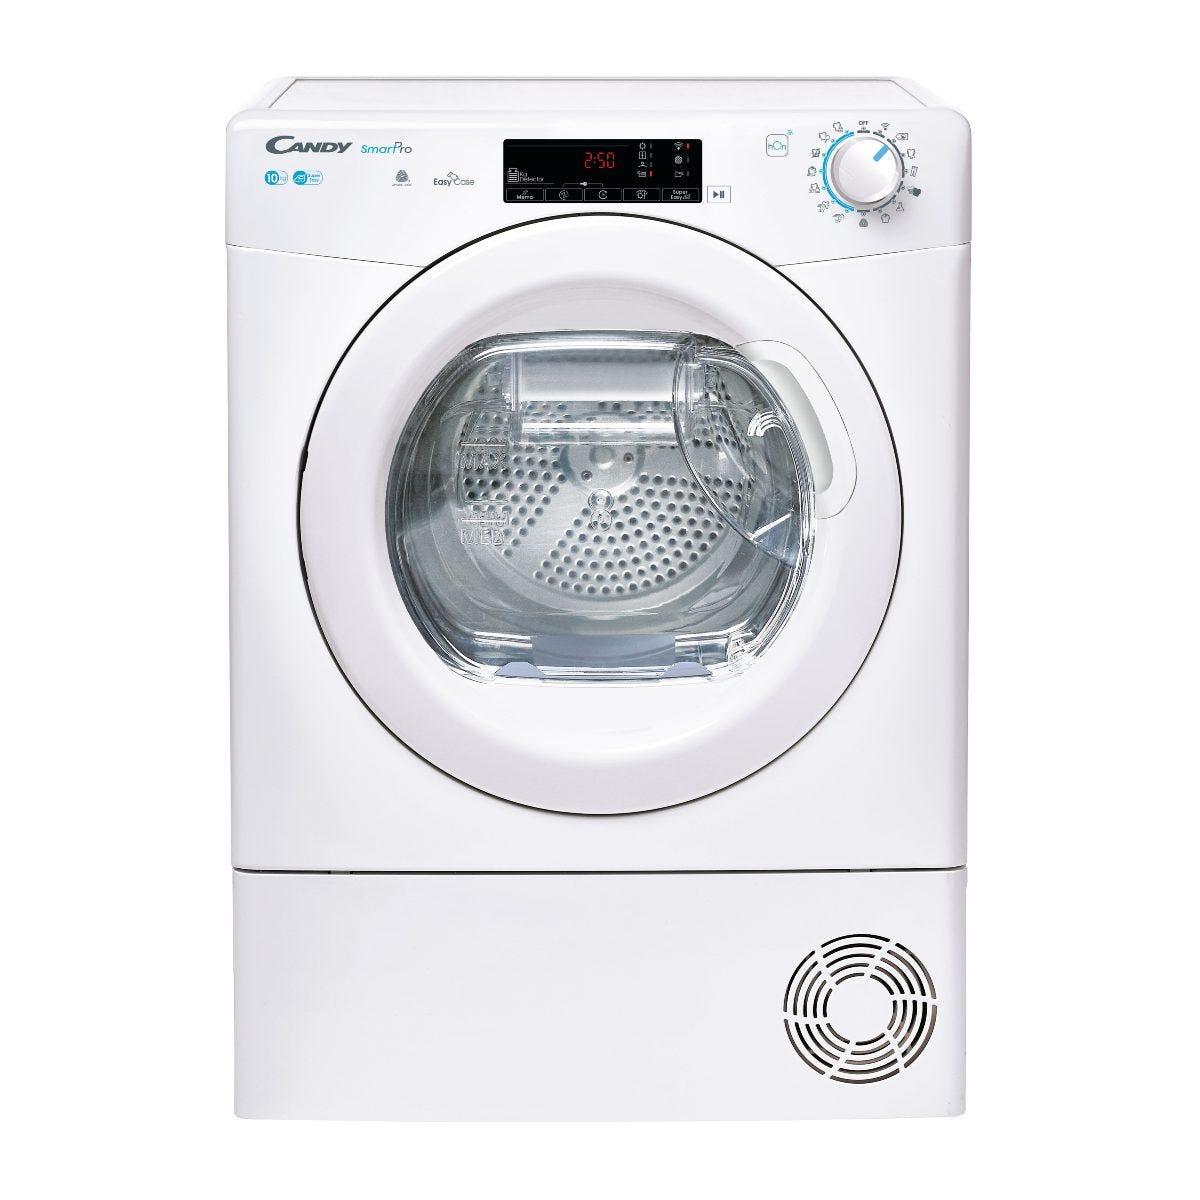 Candy CSOEC10TE-80 Smart 10kg Condenser Tumble Dryer with Aquavision - White